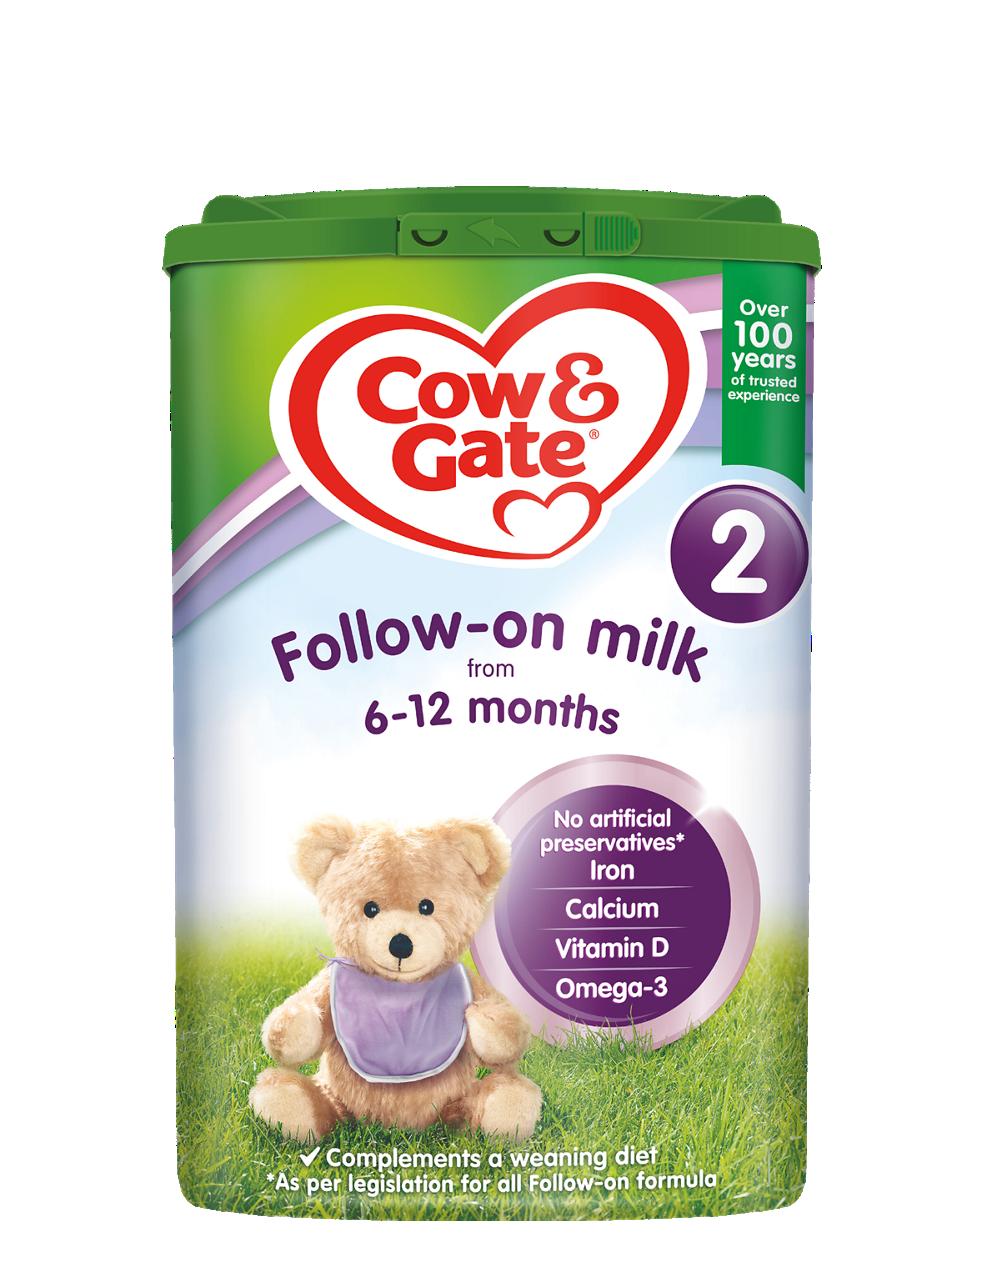 Previous Cow & Gate Stage 2 Follow-on Milk Powder 800g